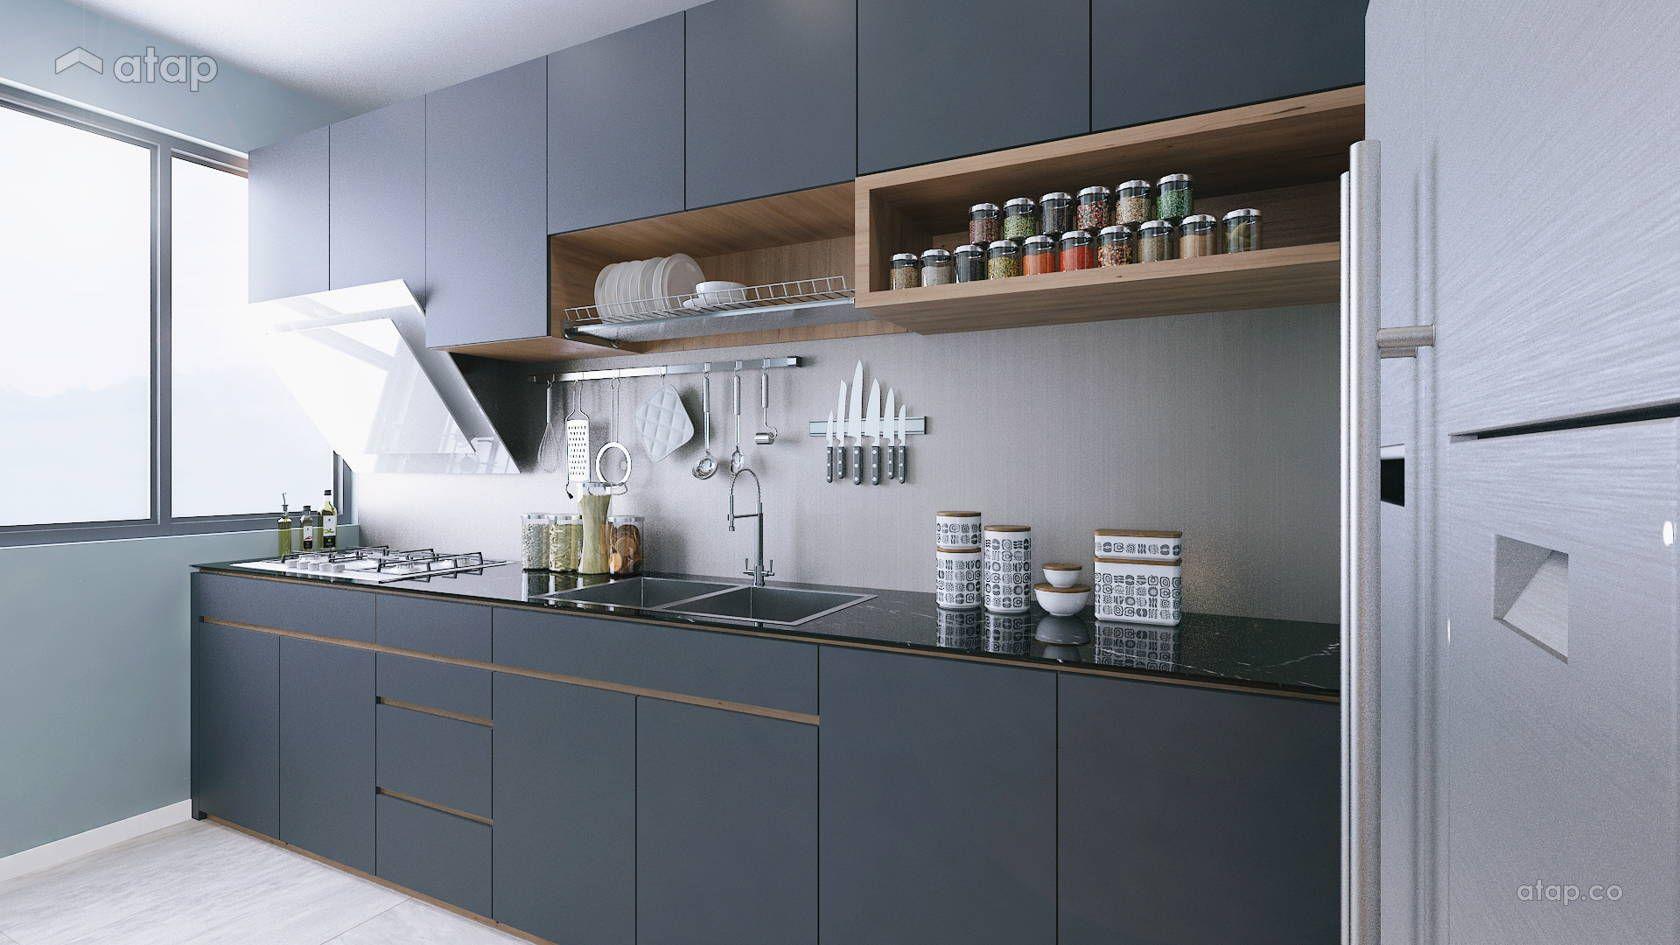 The Vyne Interior Design Renovation Ideas Photos And Price In Malaysia Atap Co Interior Design Interior Kitchen Design